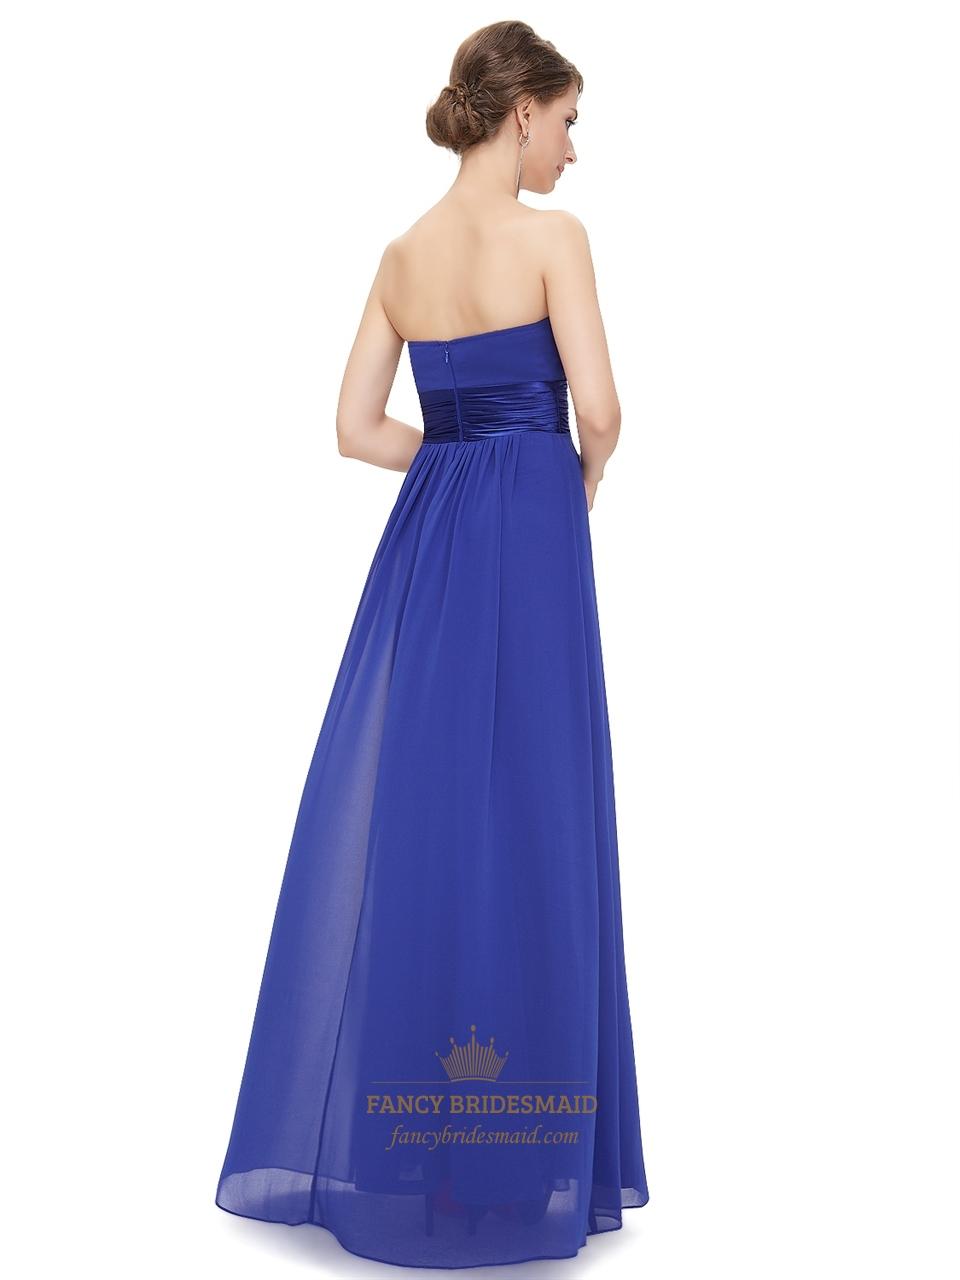 Royal Blue Chiffon Strapless Long Bridesmaid Dress For